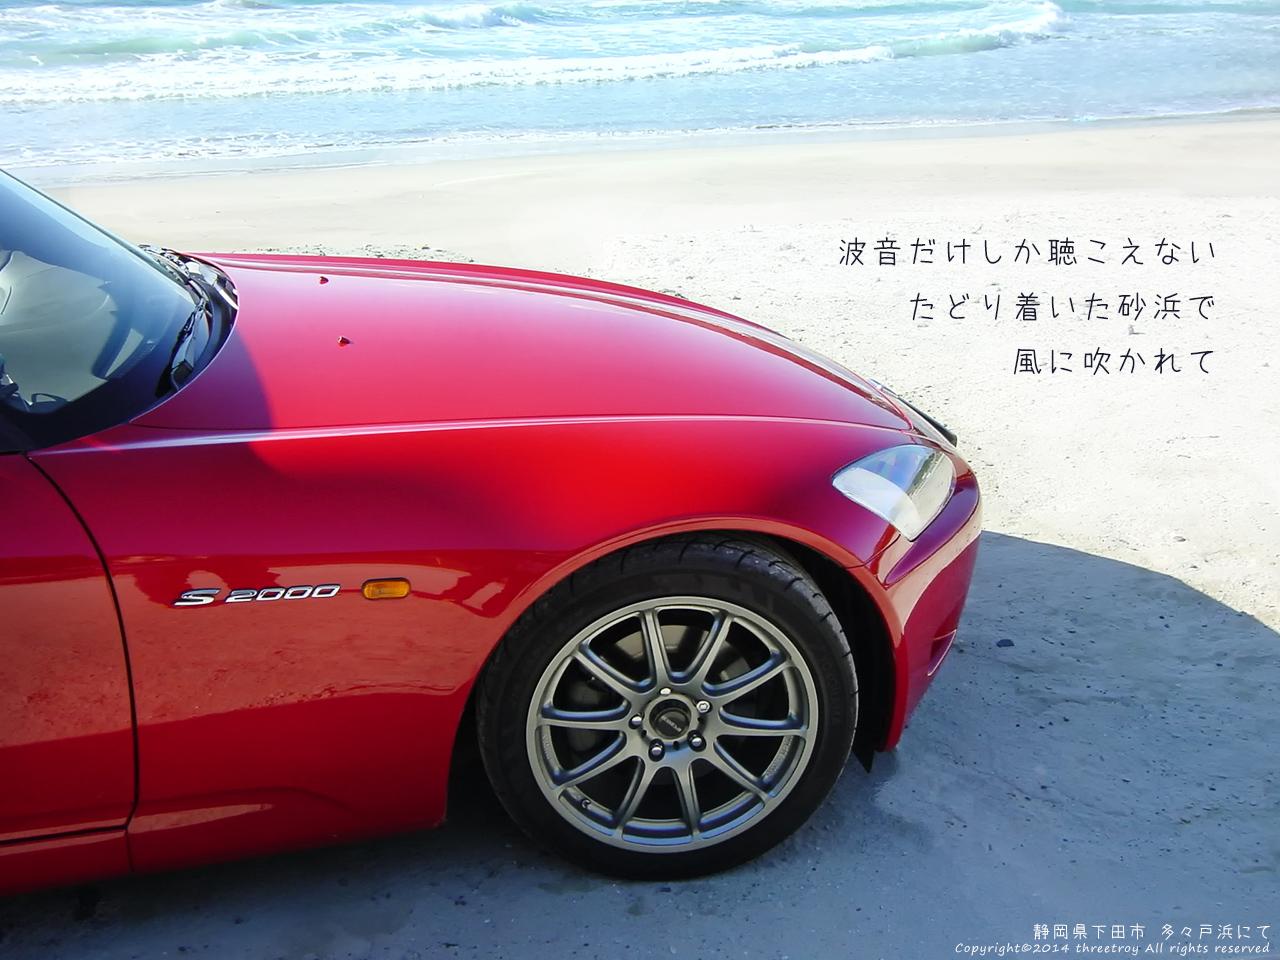 http://threetroy.sakura.ne.jp/blogdata/ikku1280/DSC00044.jpg